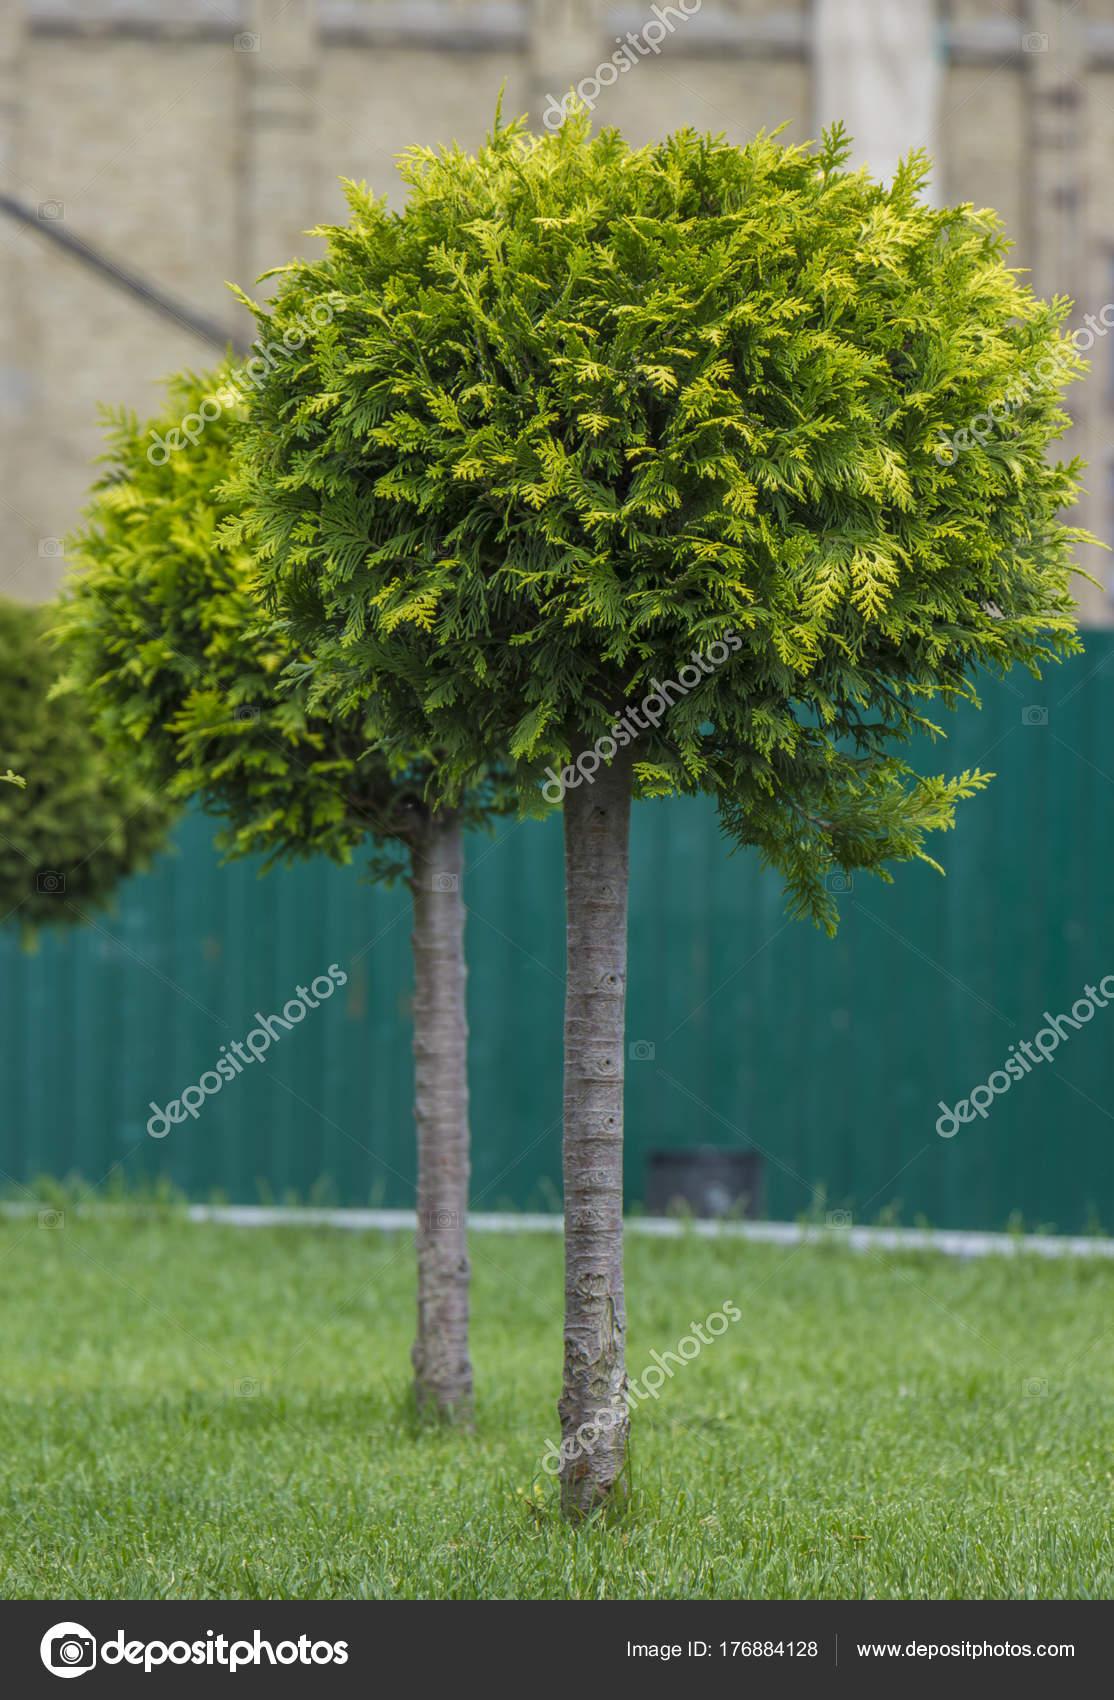 Application Of Globular Shredded Thuja In A Landscape Design Stock Photo Image By C Maykal 176884128